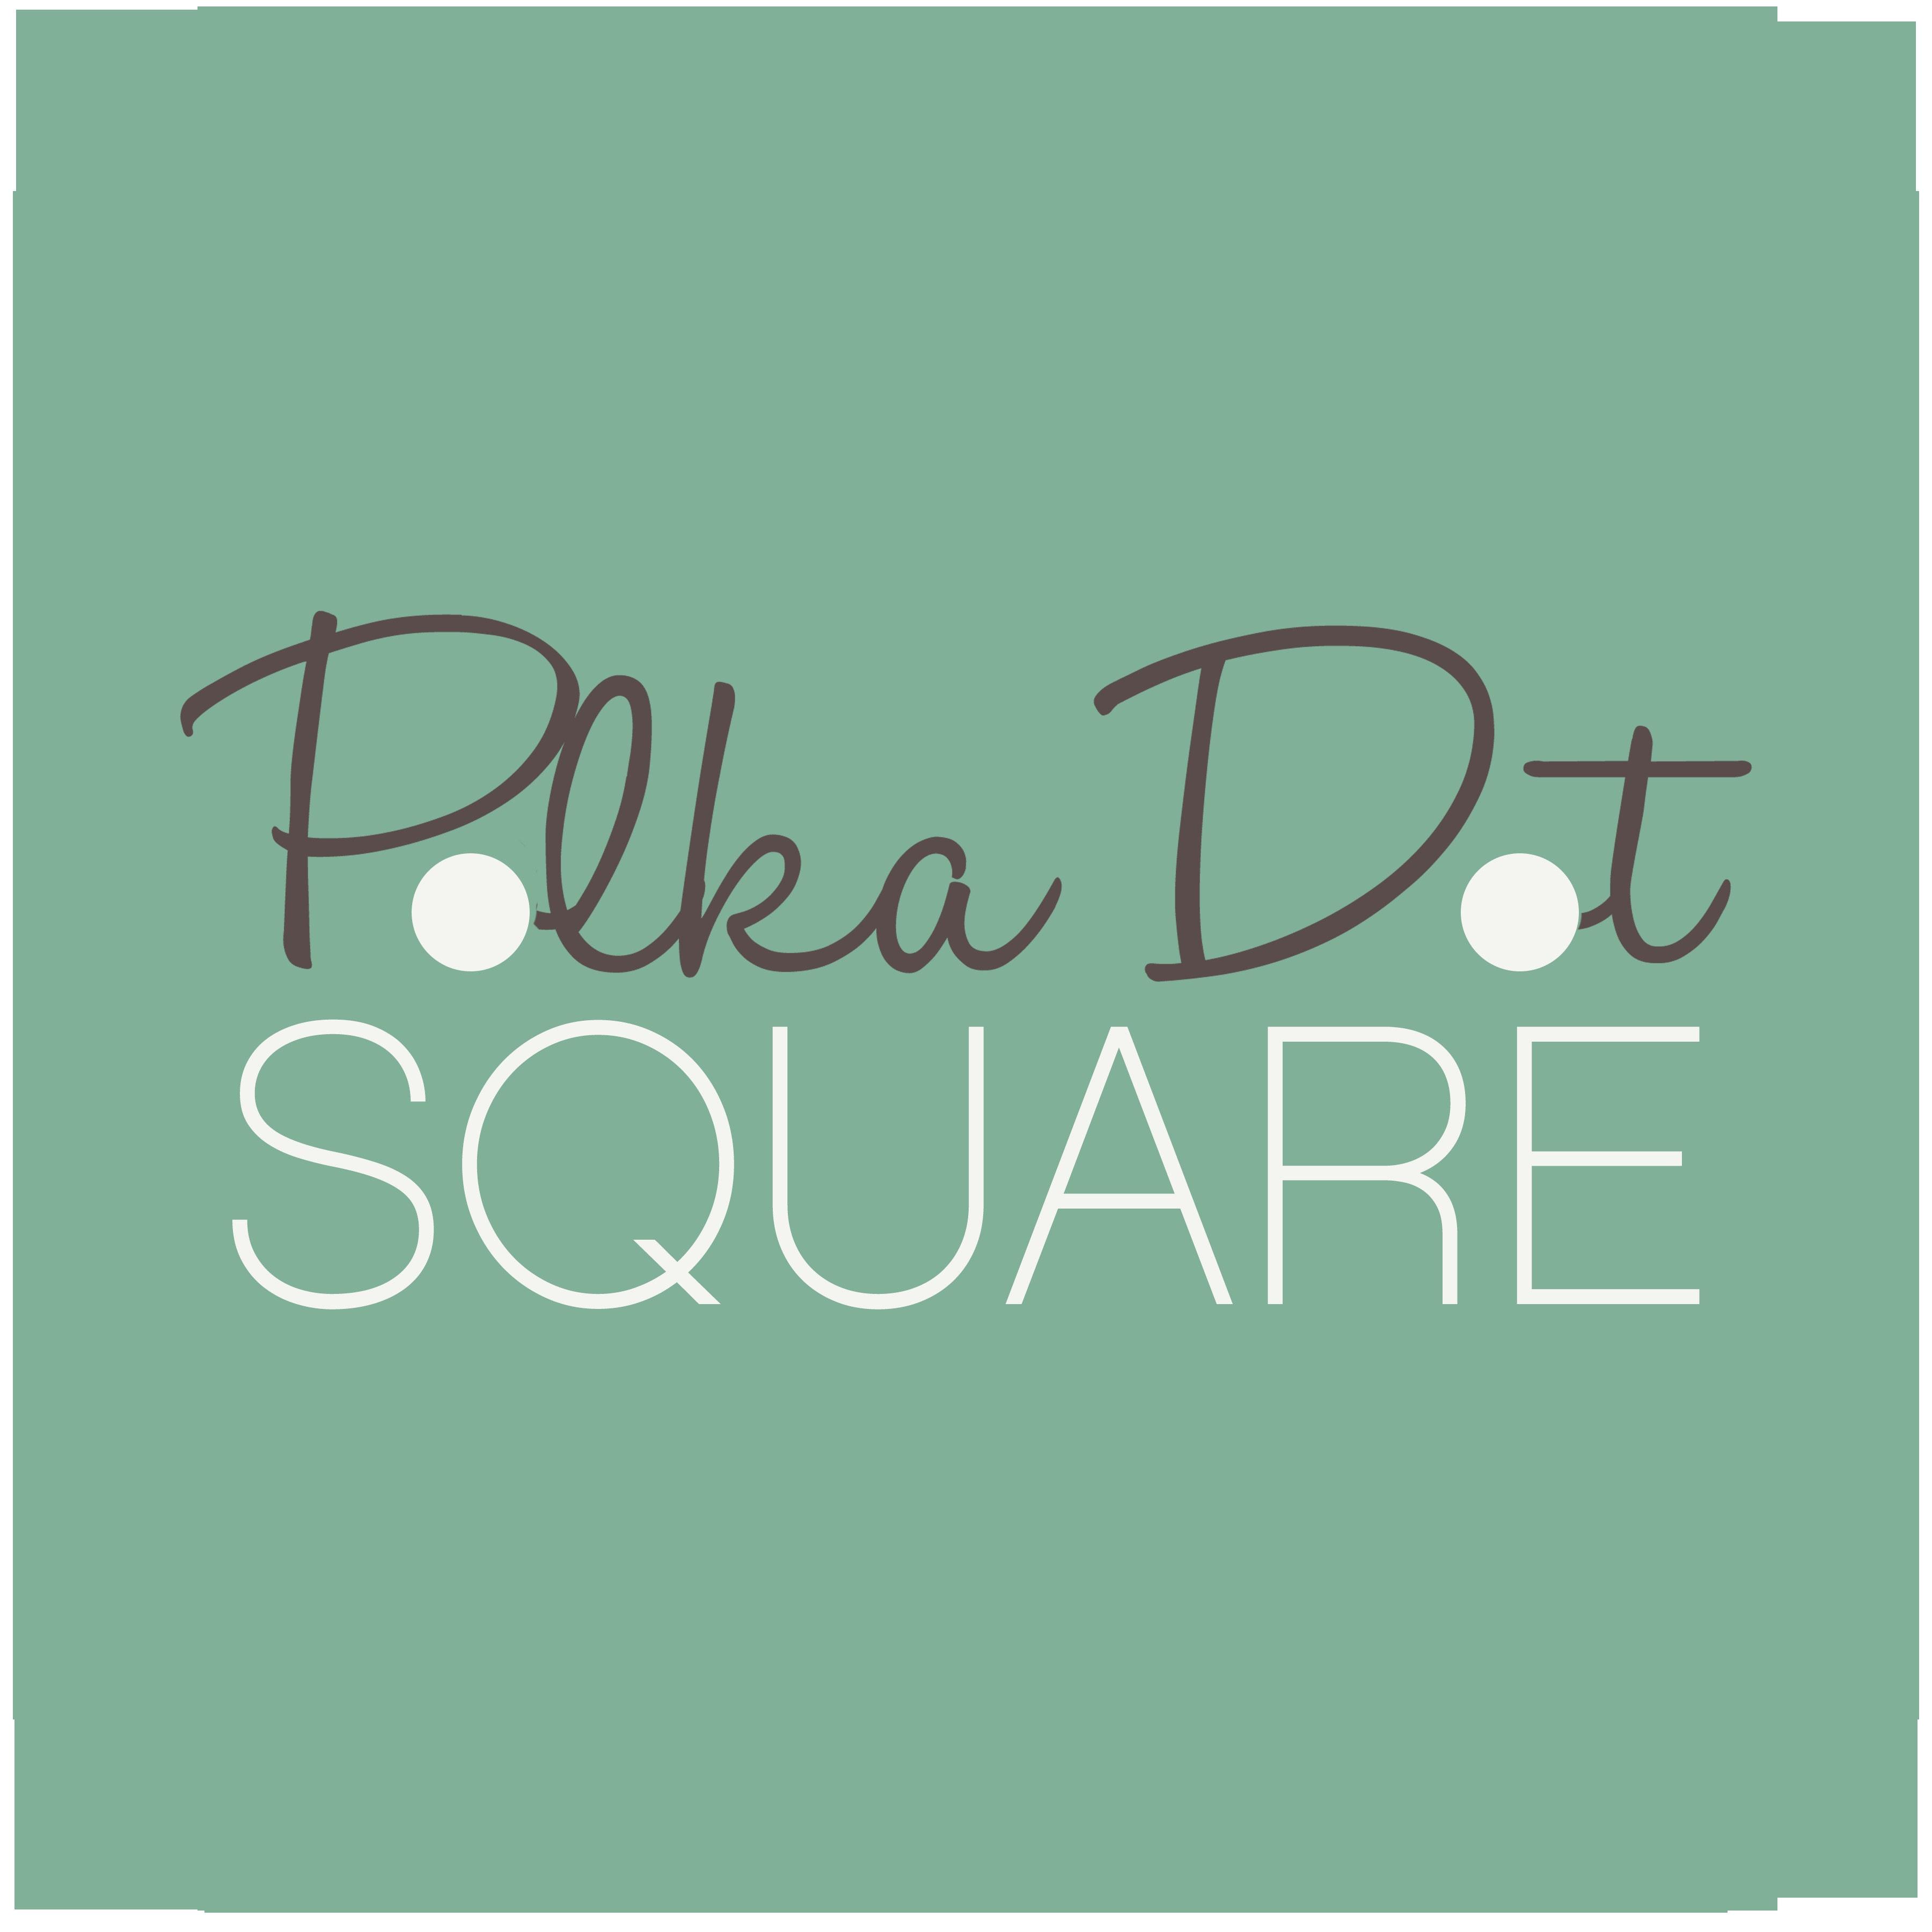 PolkaDotSquareDesign